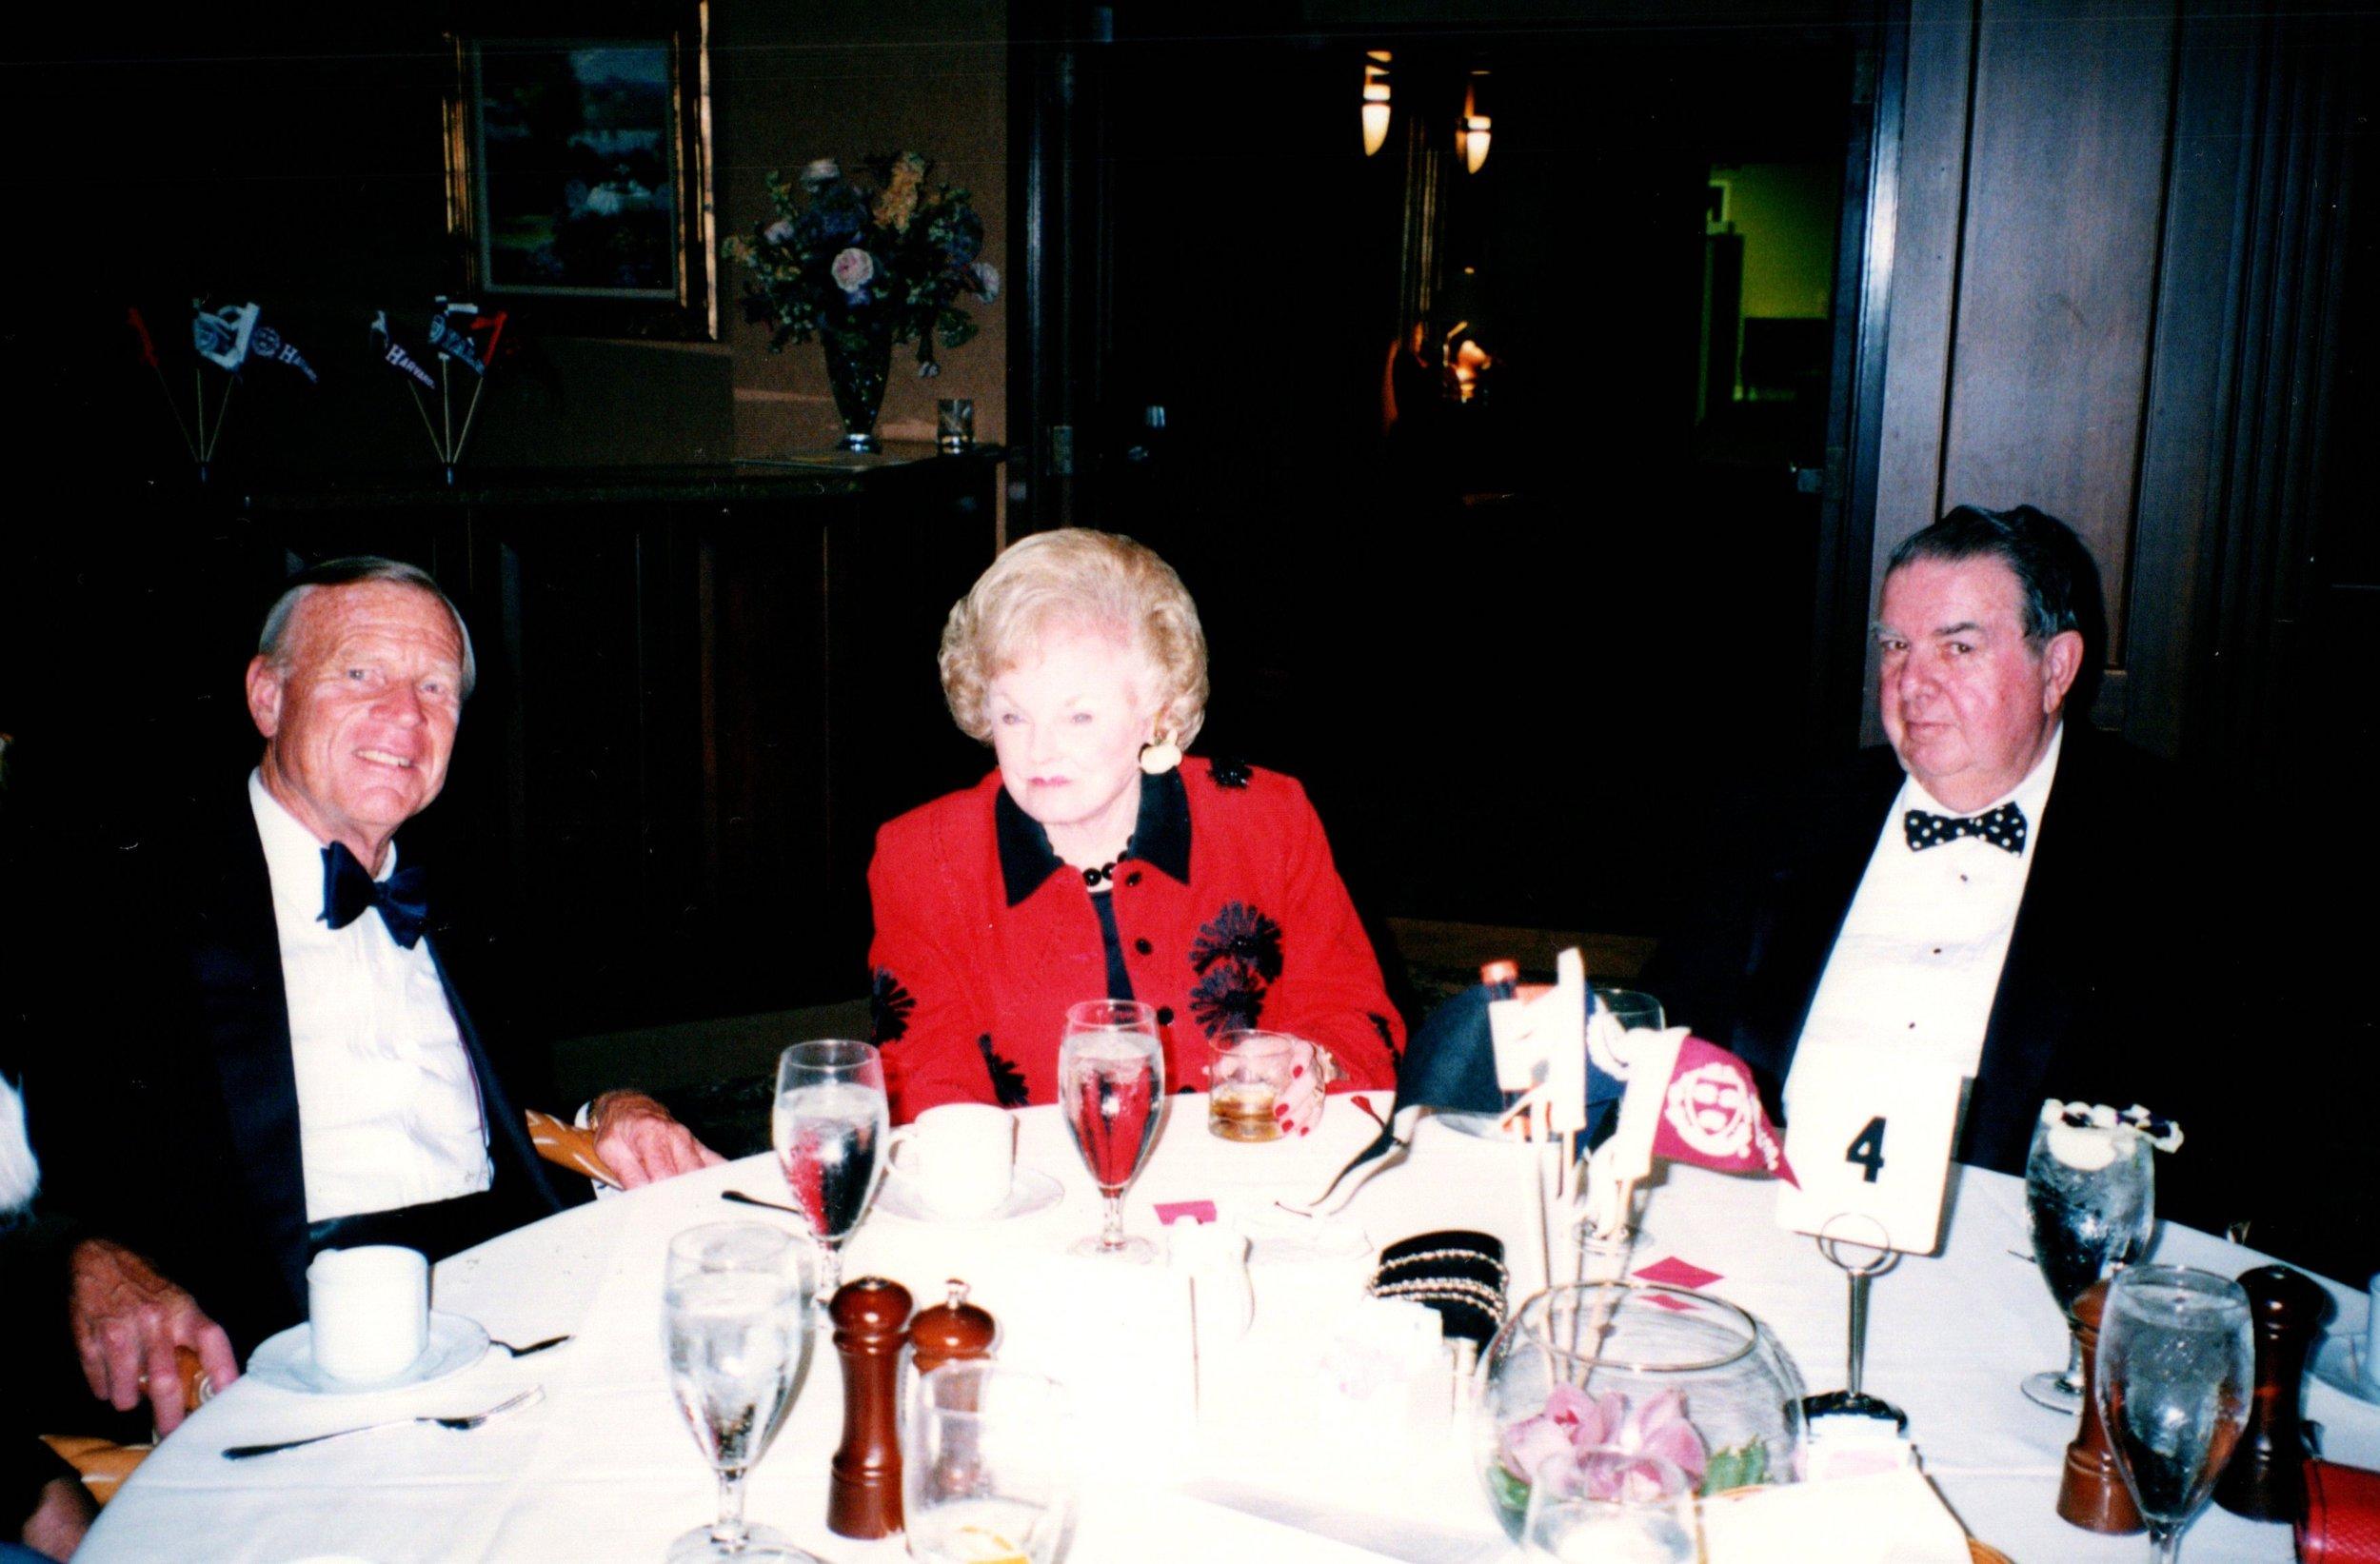 2_11_2002 - HYP DINNER DANCE - VINEYARD COUNTRY CLUB 6.jpg